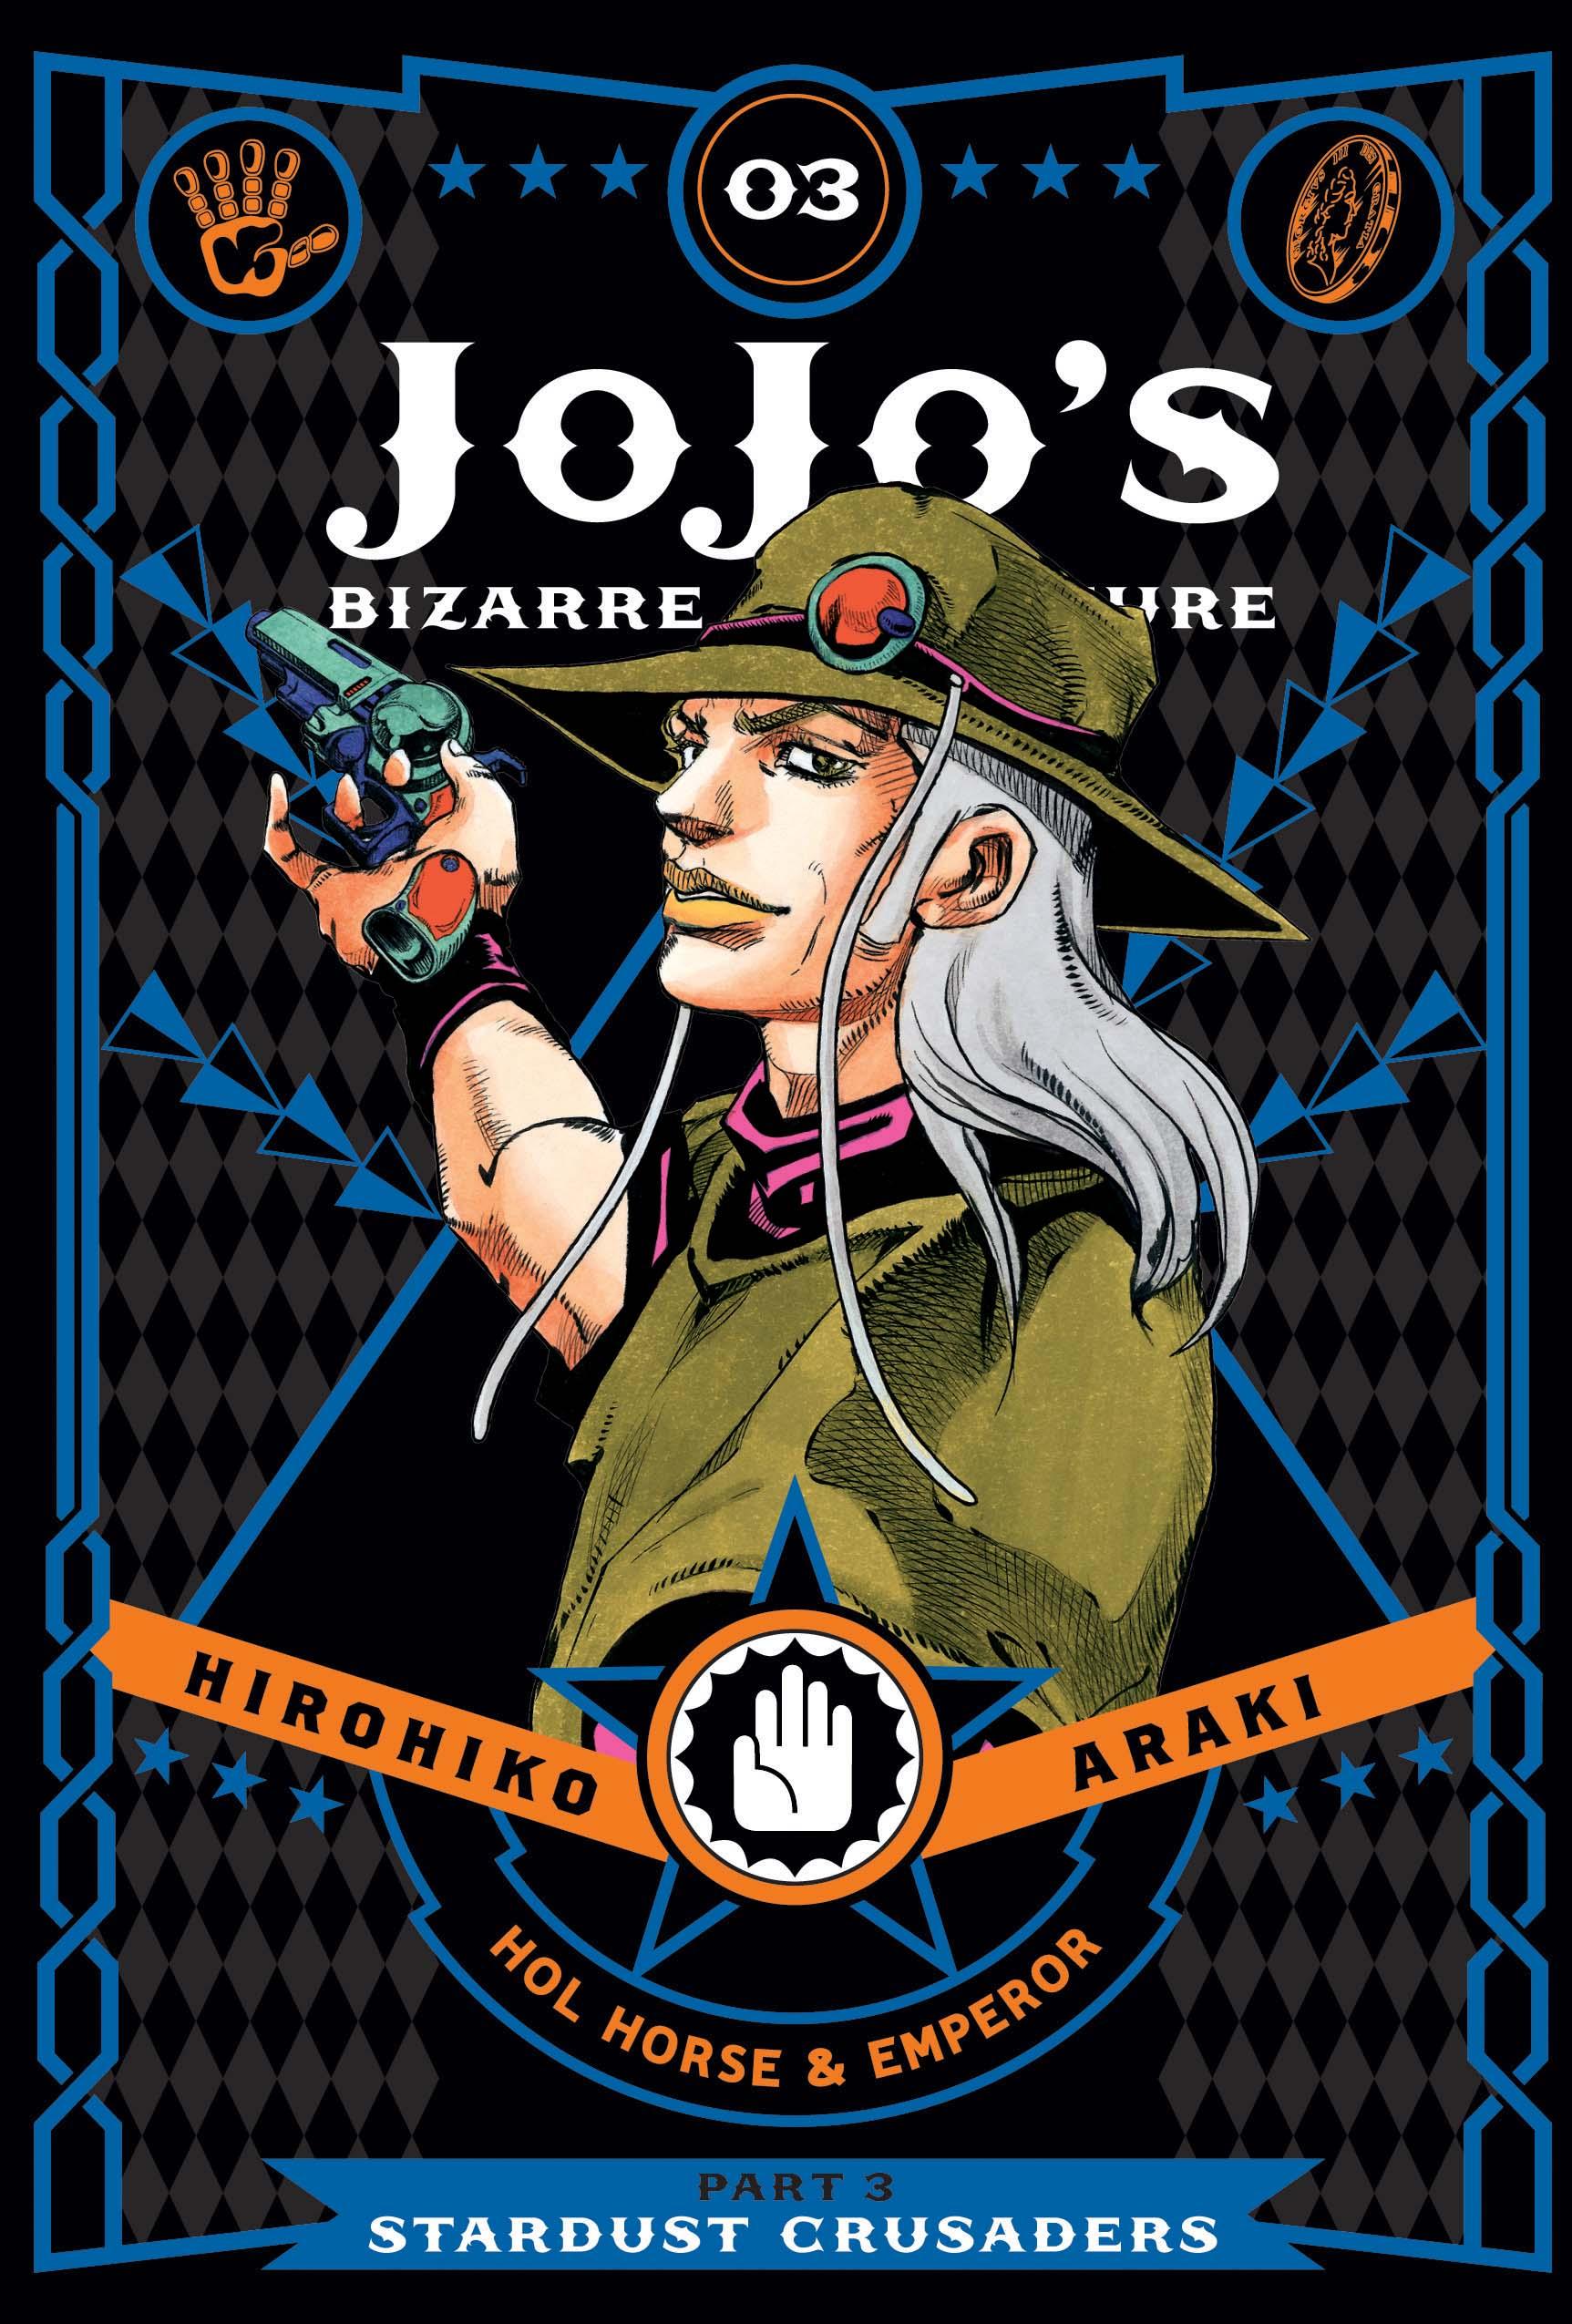 JoJo's Bizarre Adventure Part 3 Stardust Crusaders Manga Volume 3 (Hardcover)